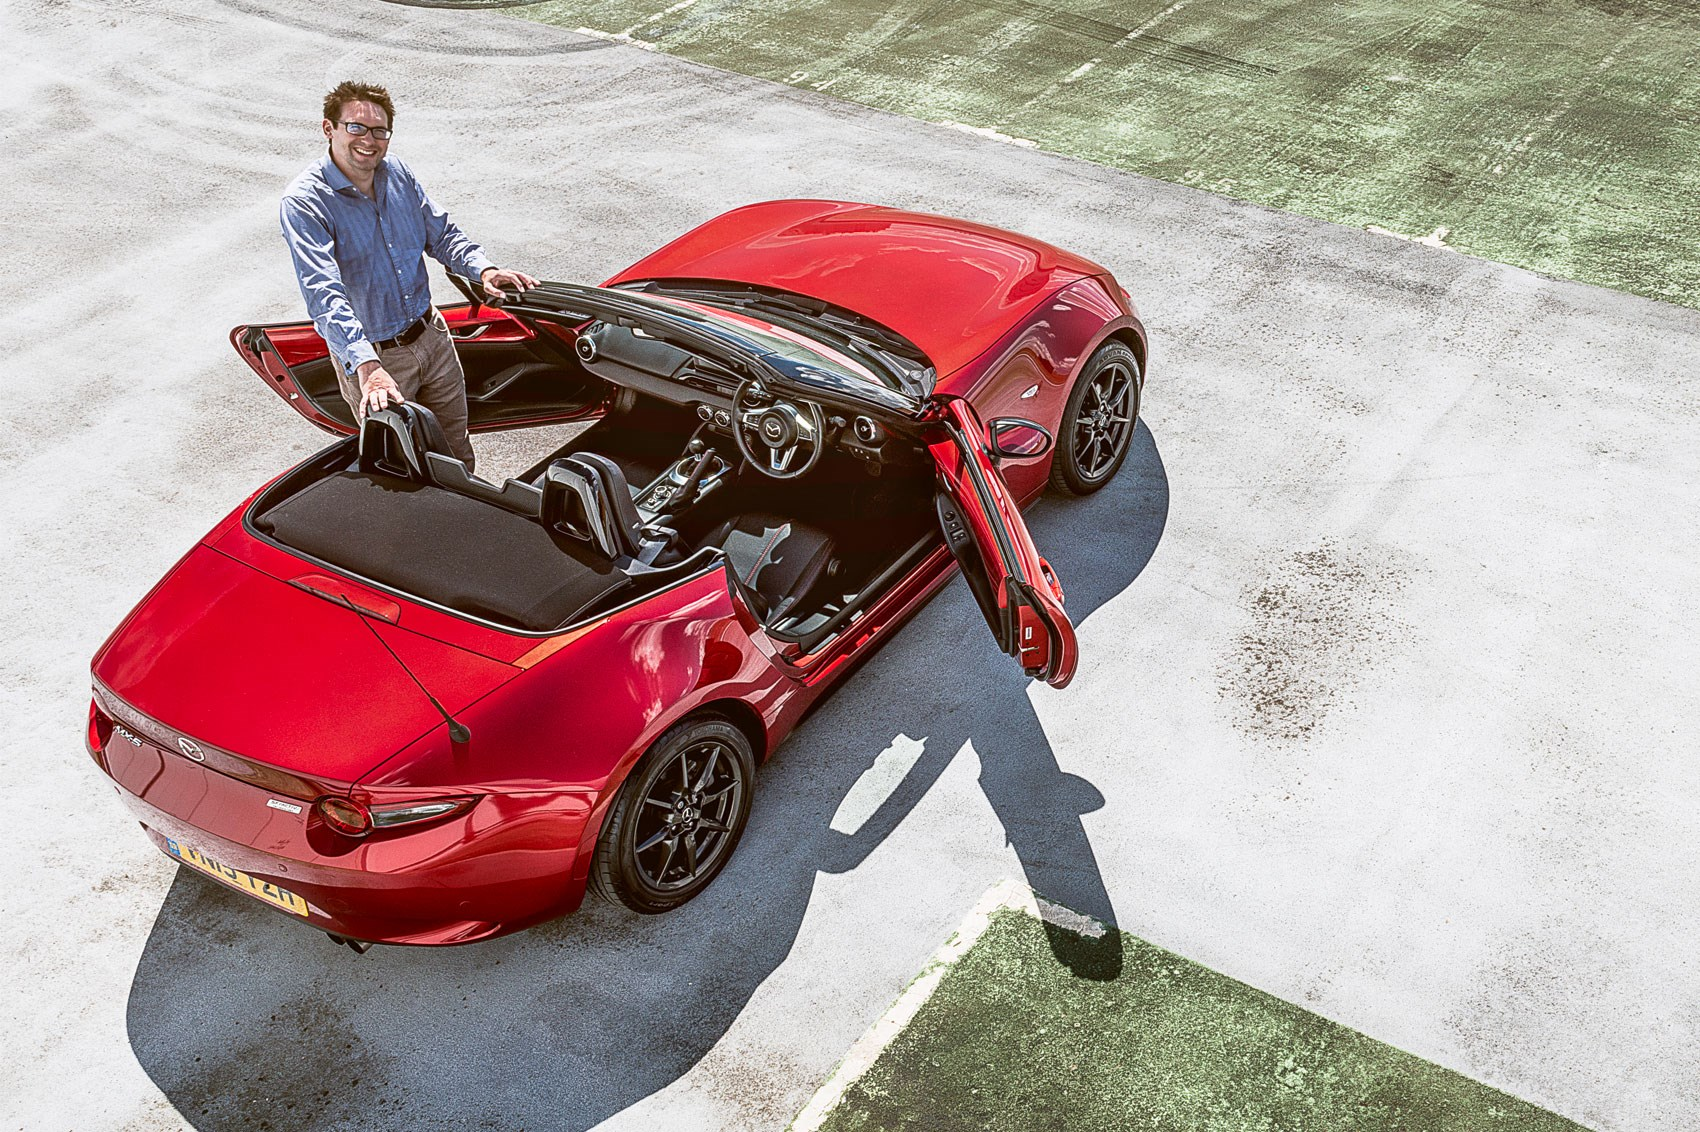 mazda mx-5 1.5 sport nav (2016) long-term test review | car magazine